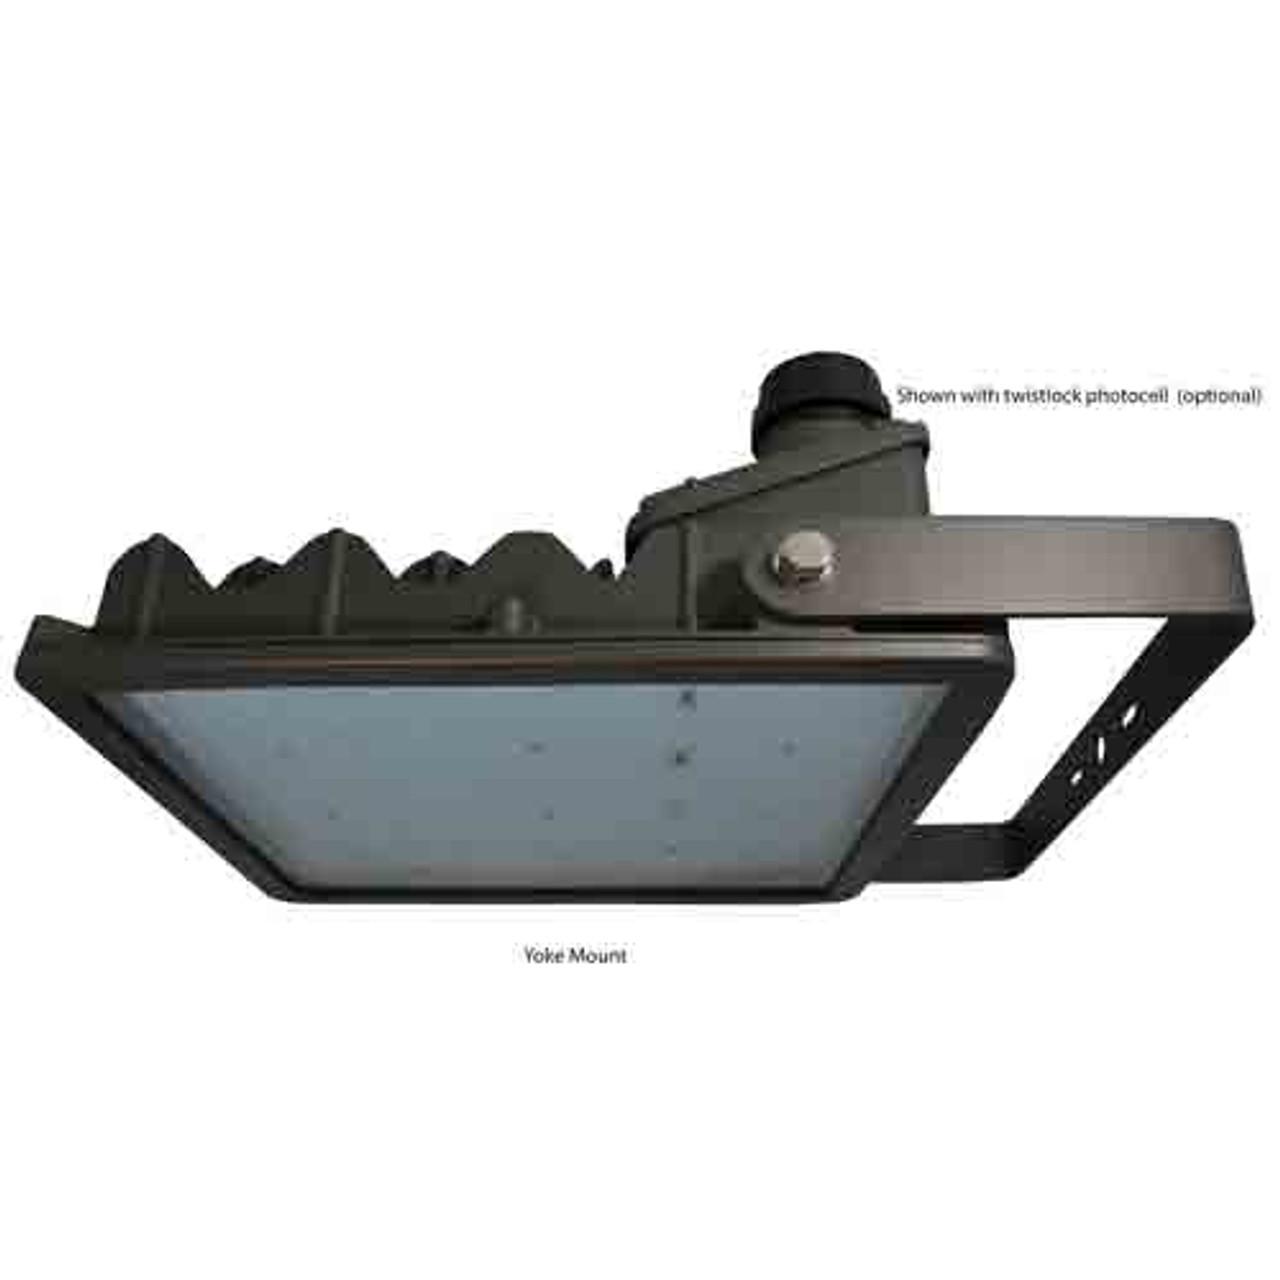 175 Watt LED Area Light 16,964 Lumens with Yoke Mount